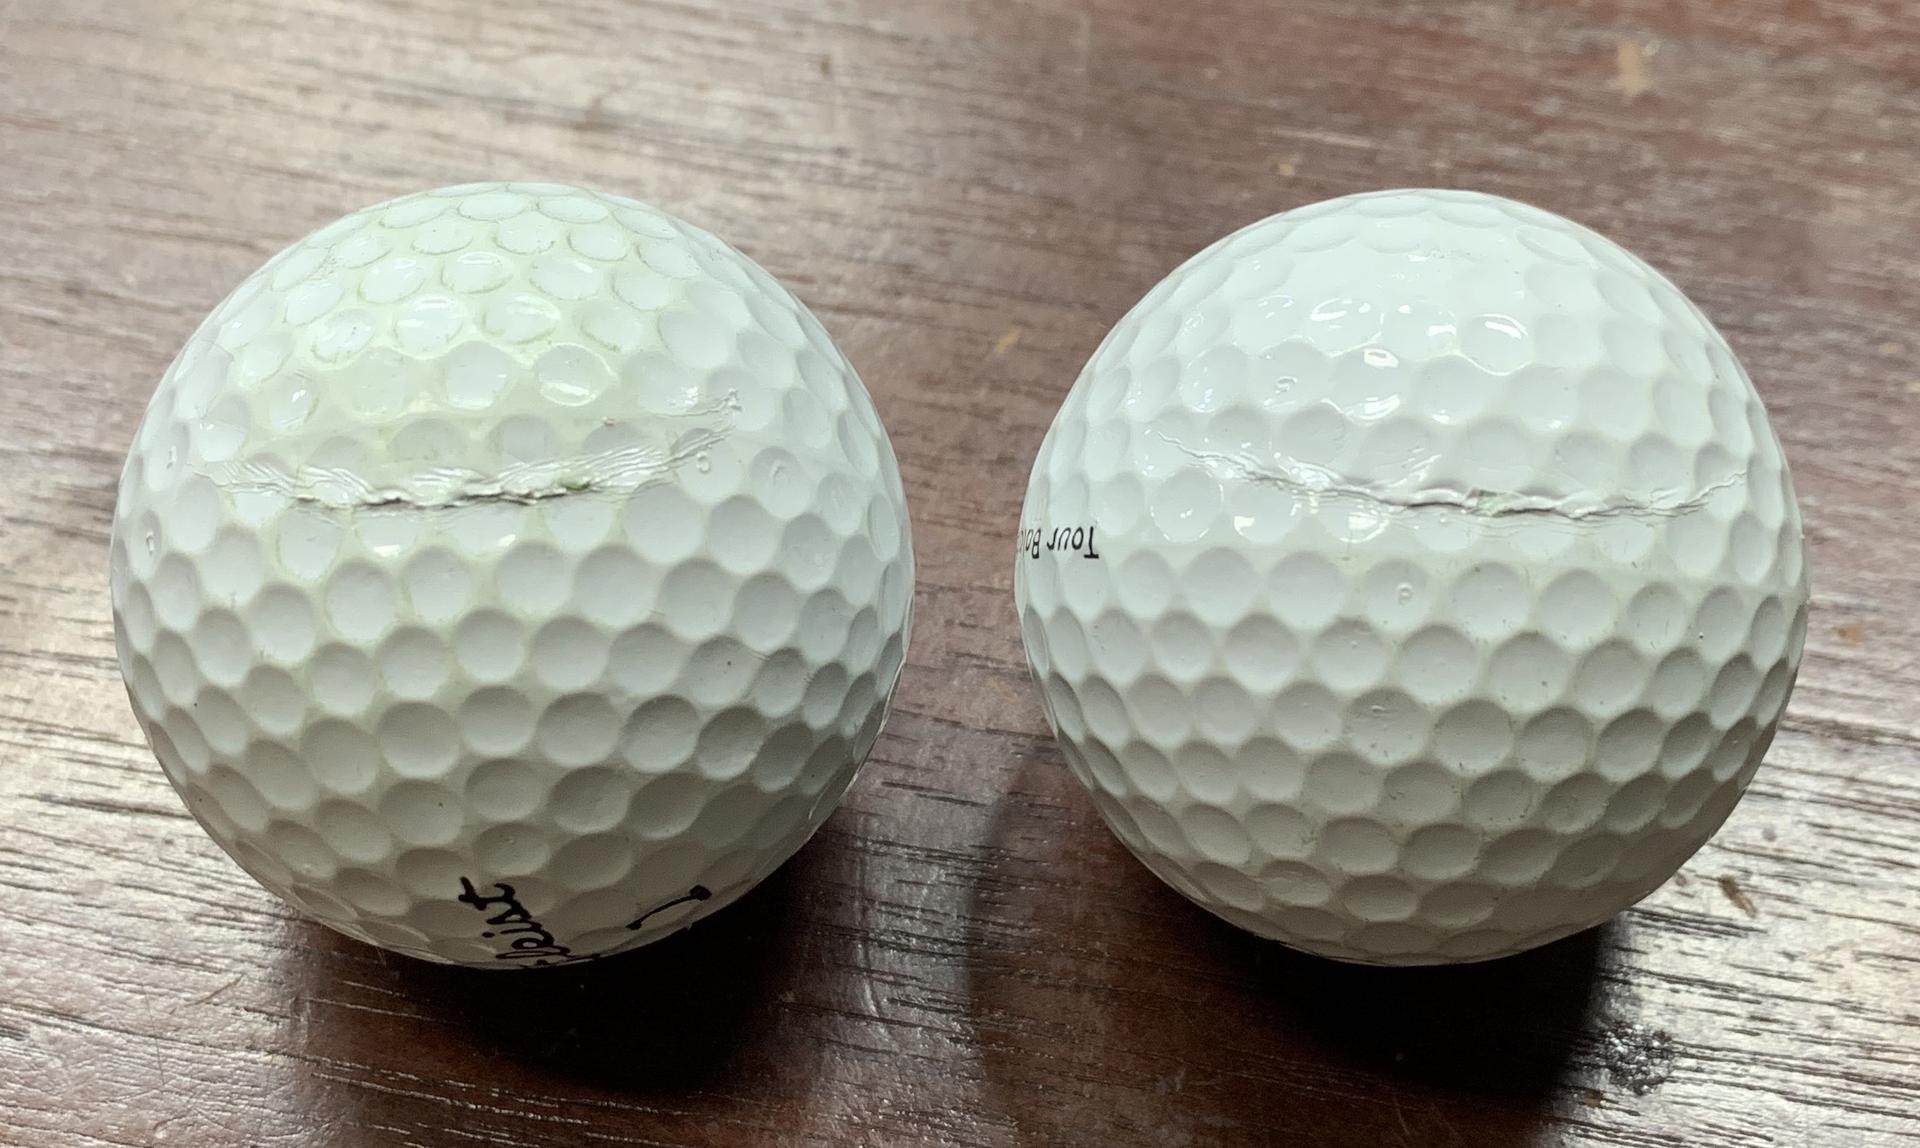 balata_smiley_golf_ball_closeup.jpg